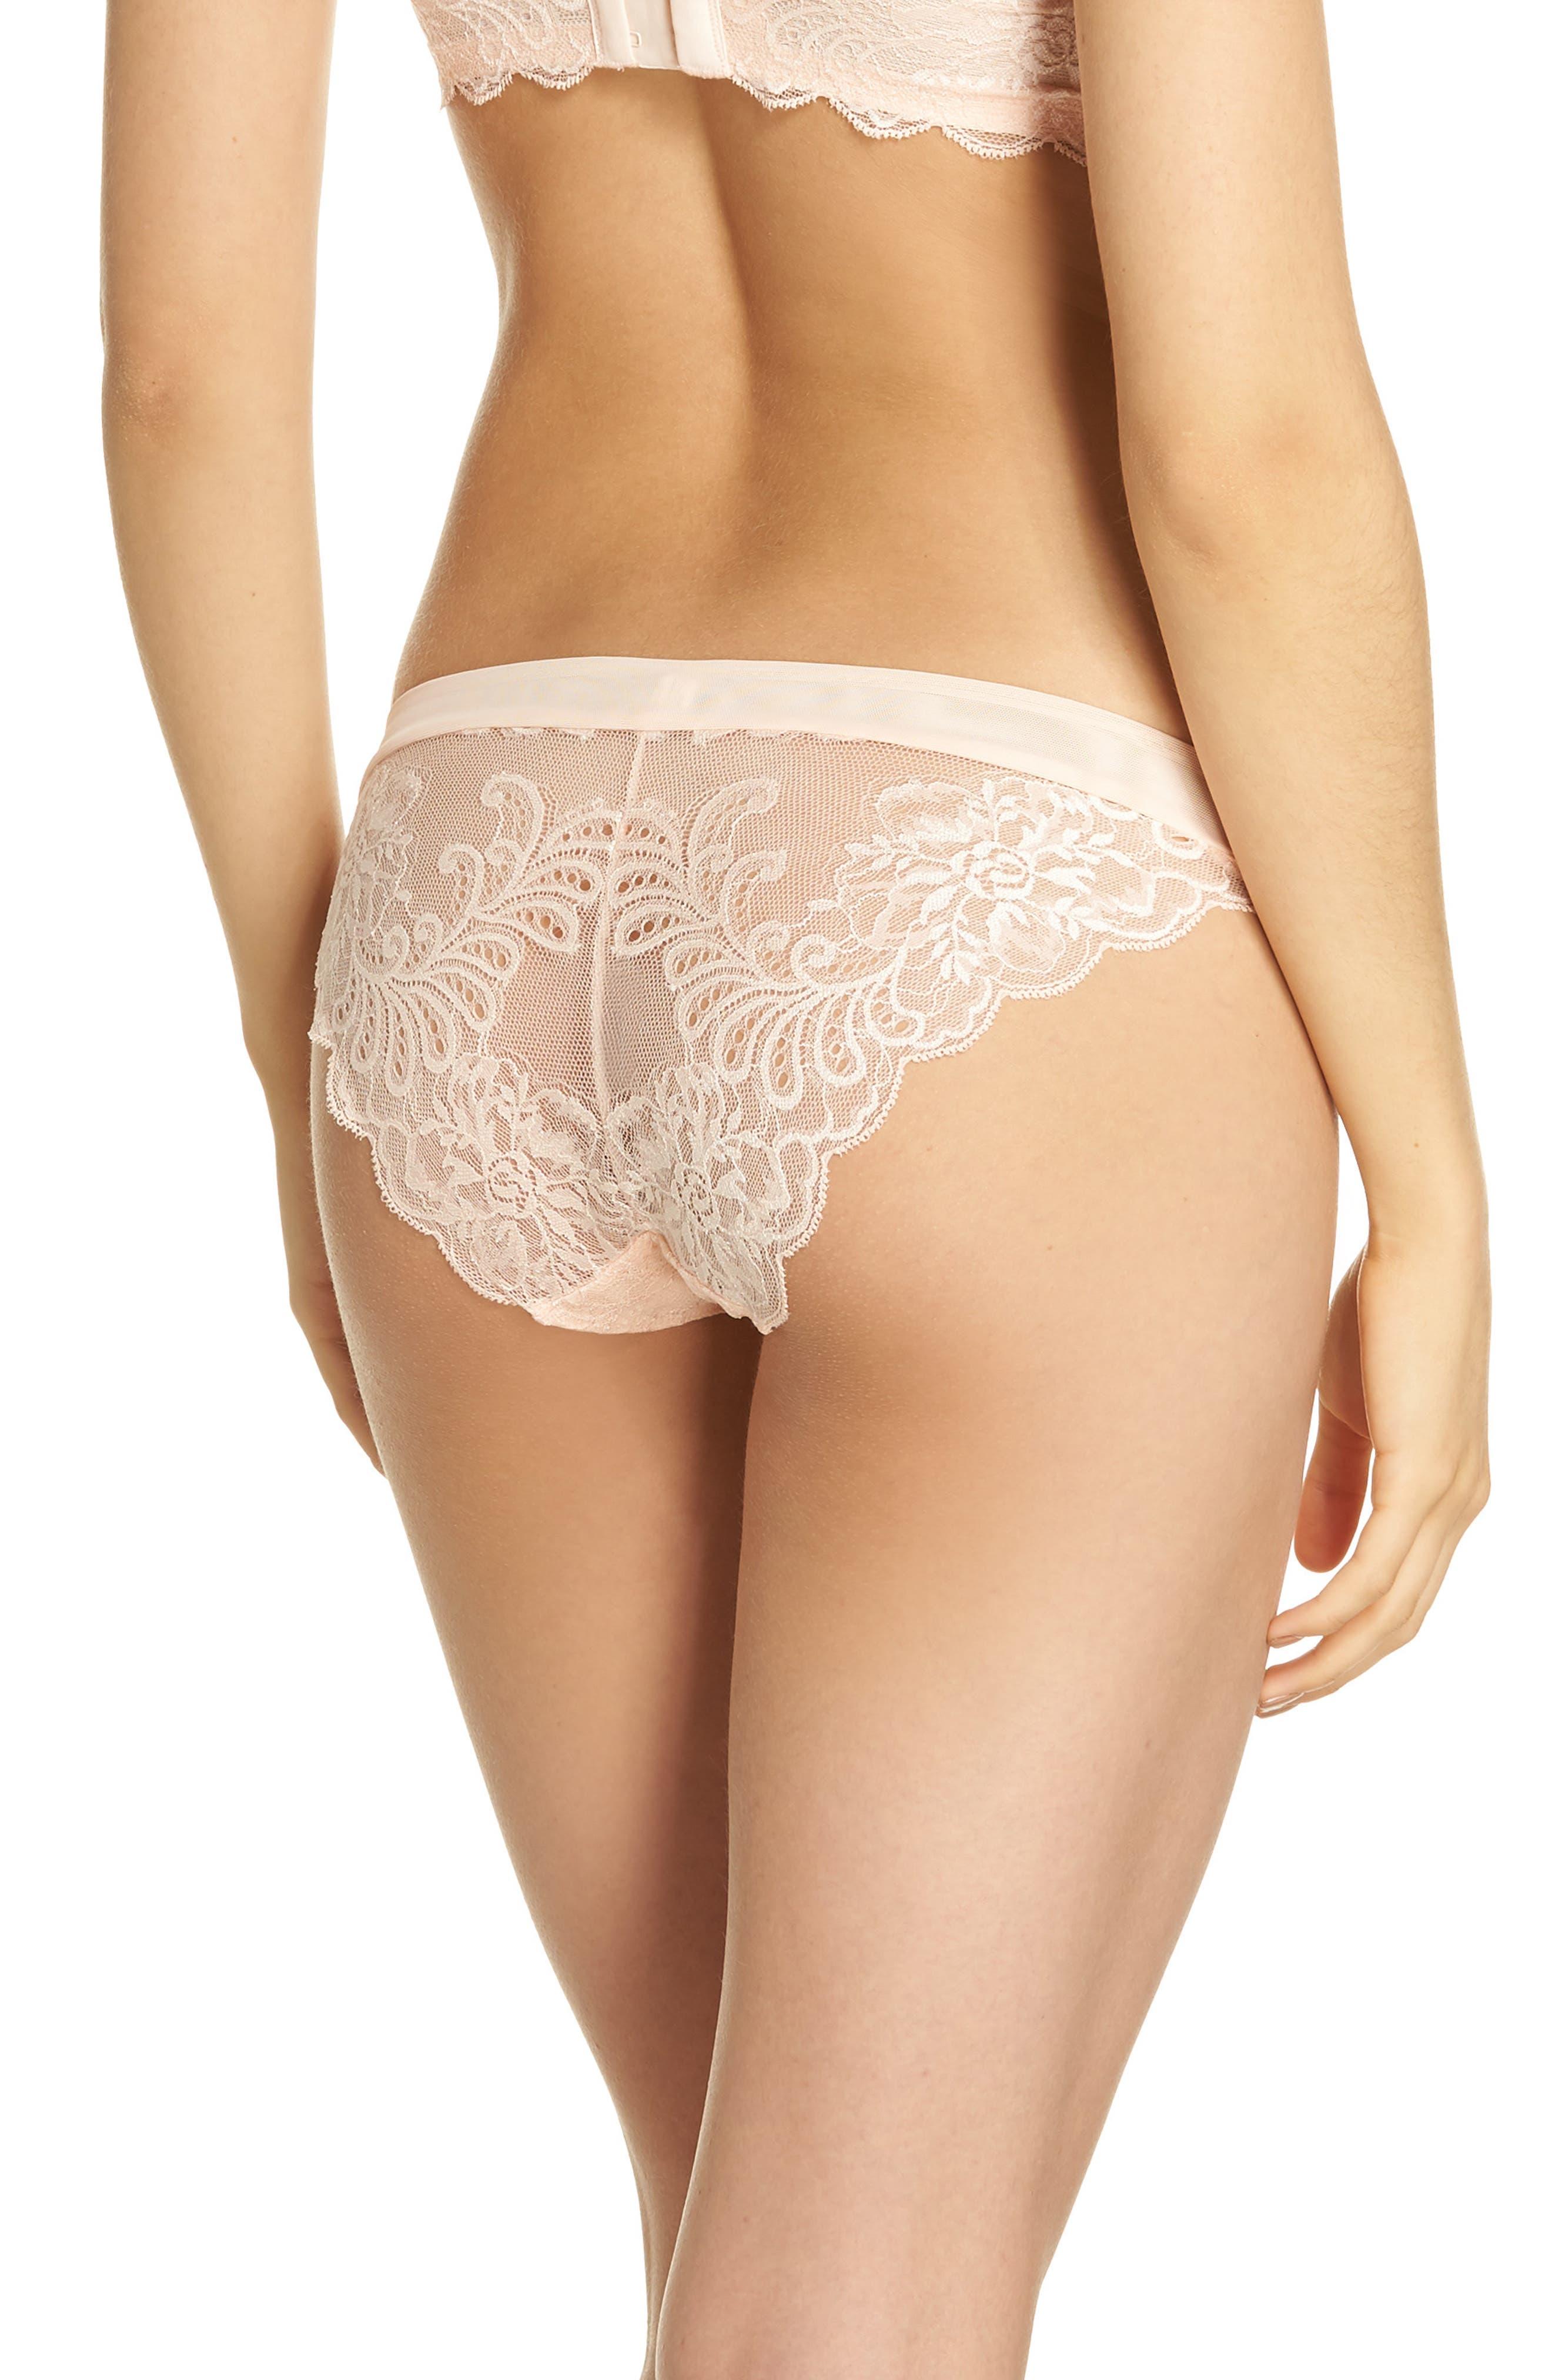 'Sophia' Lace Bikini,                             Alternate thumbnail 2, color,                             Peach Blossom